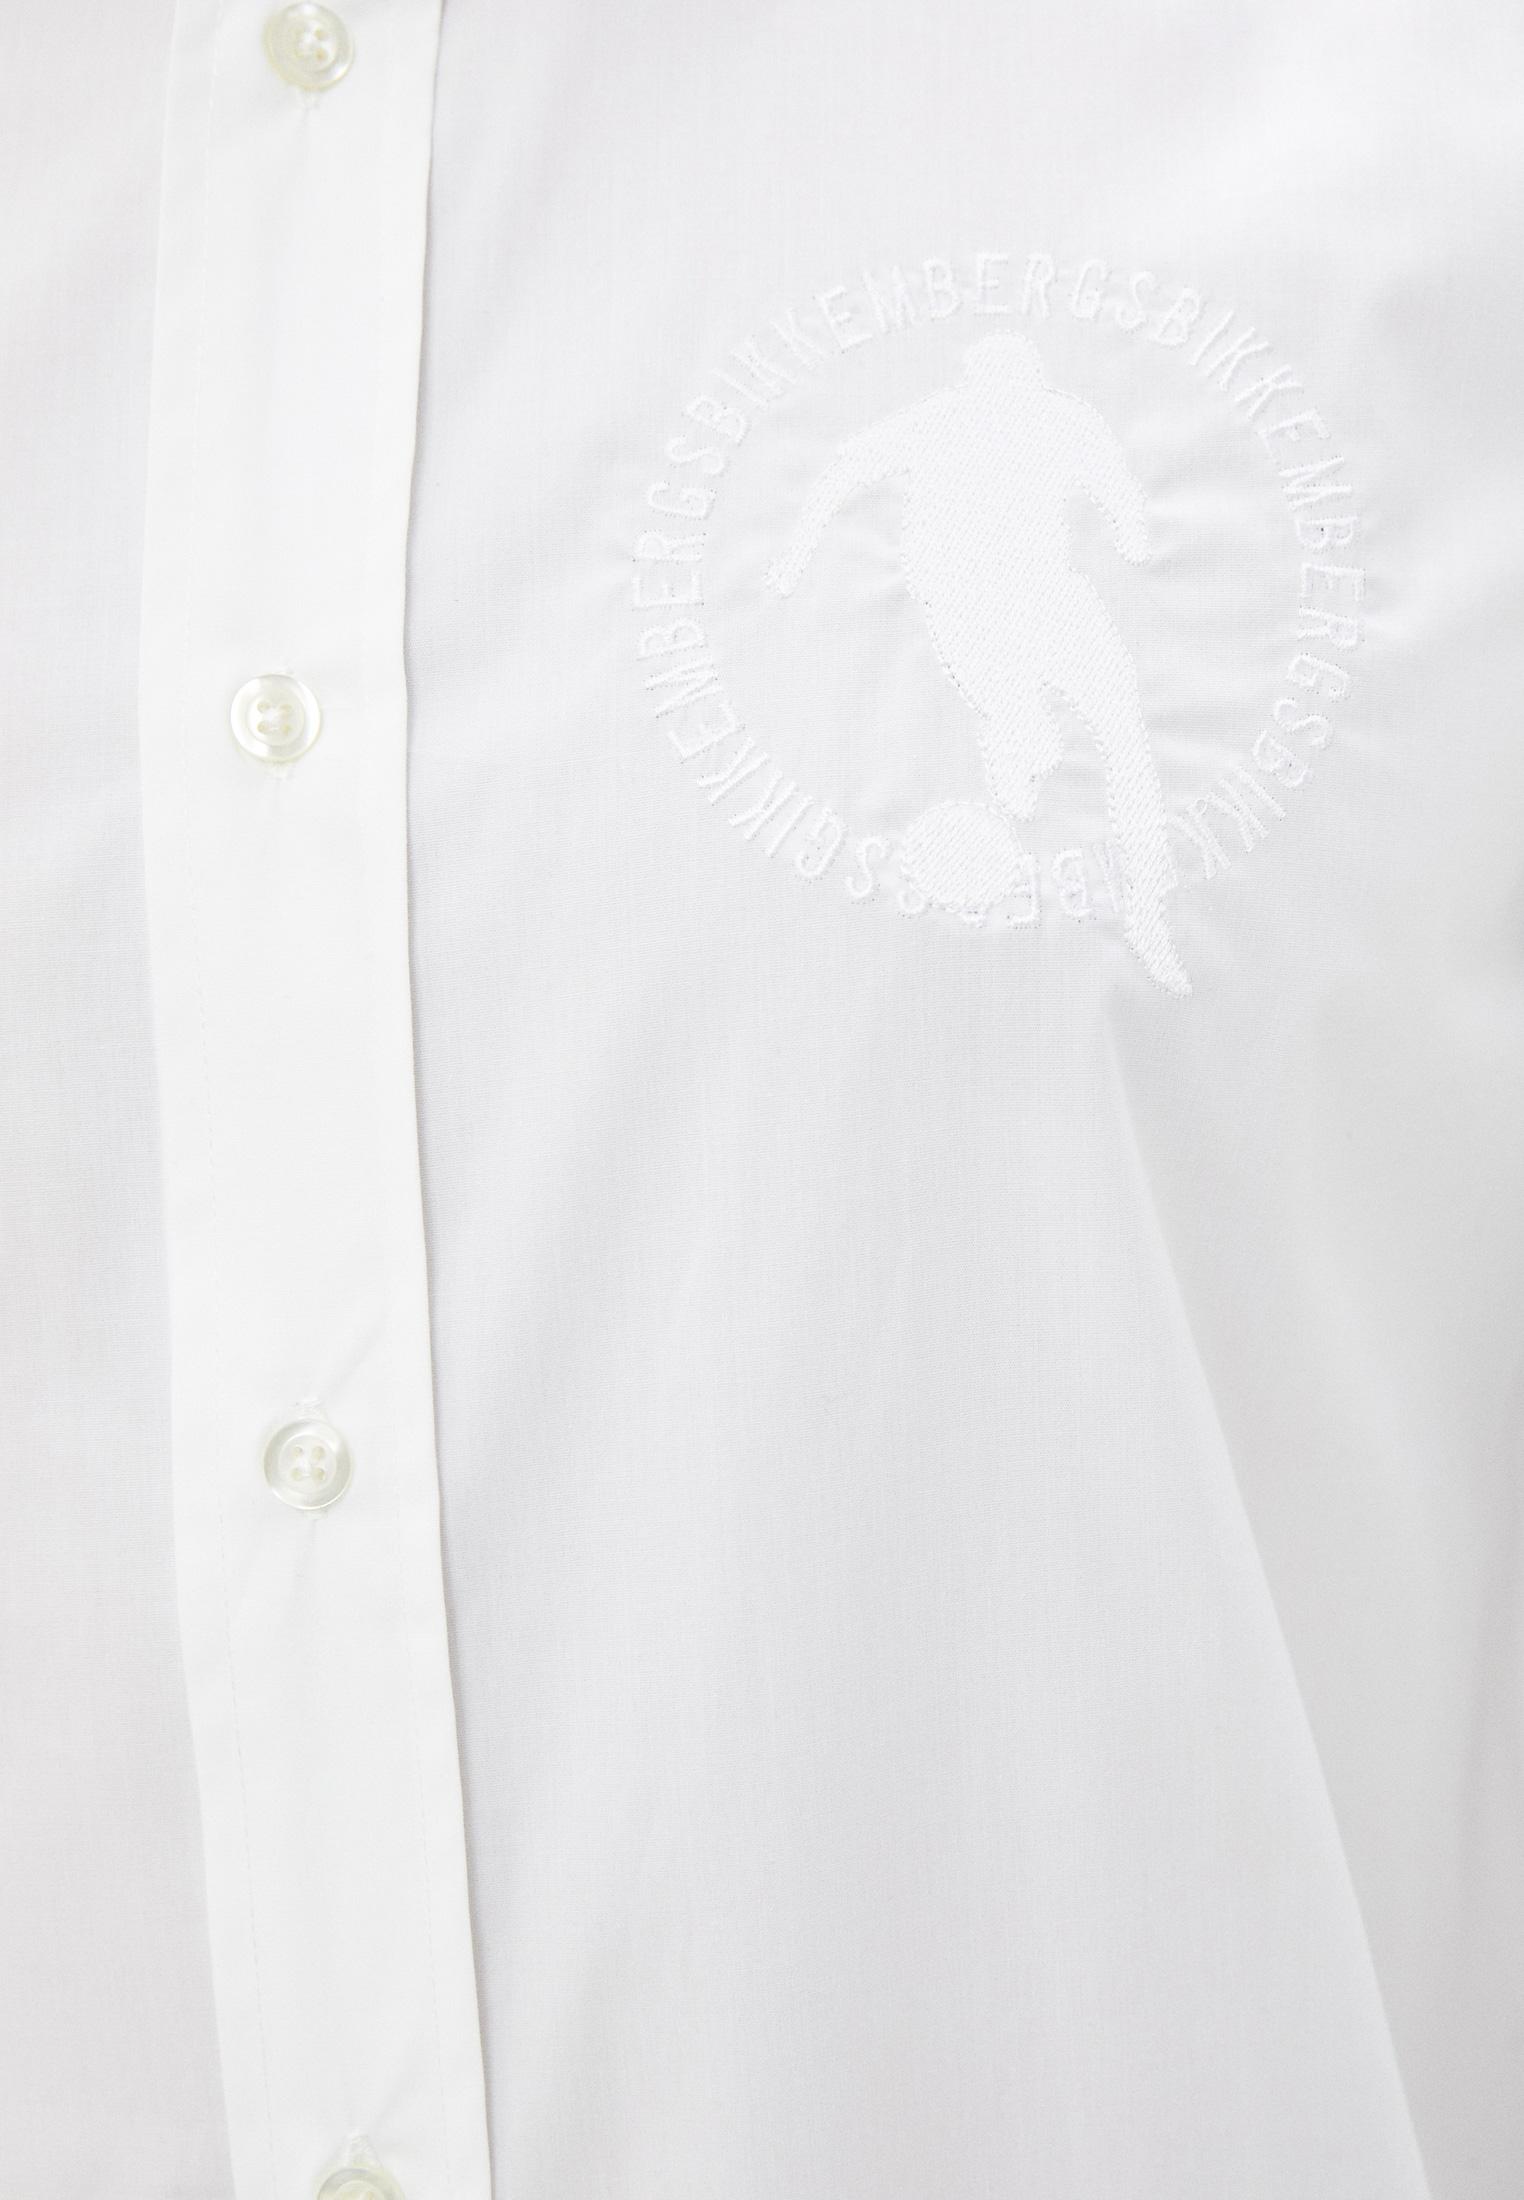 Рубашка с длинным рукавом Bikkembergs (Биккембергс) C C 009 2C S 2931: изображение 12